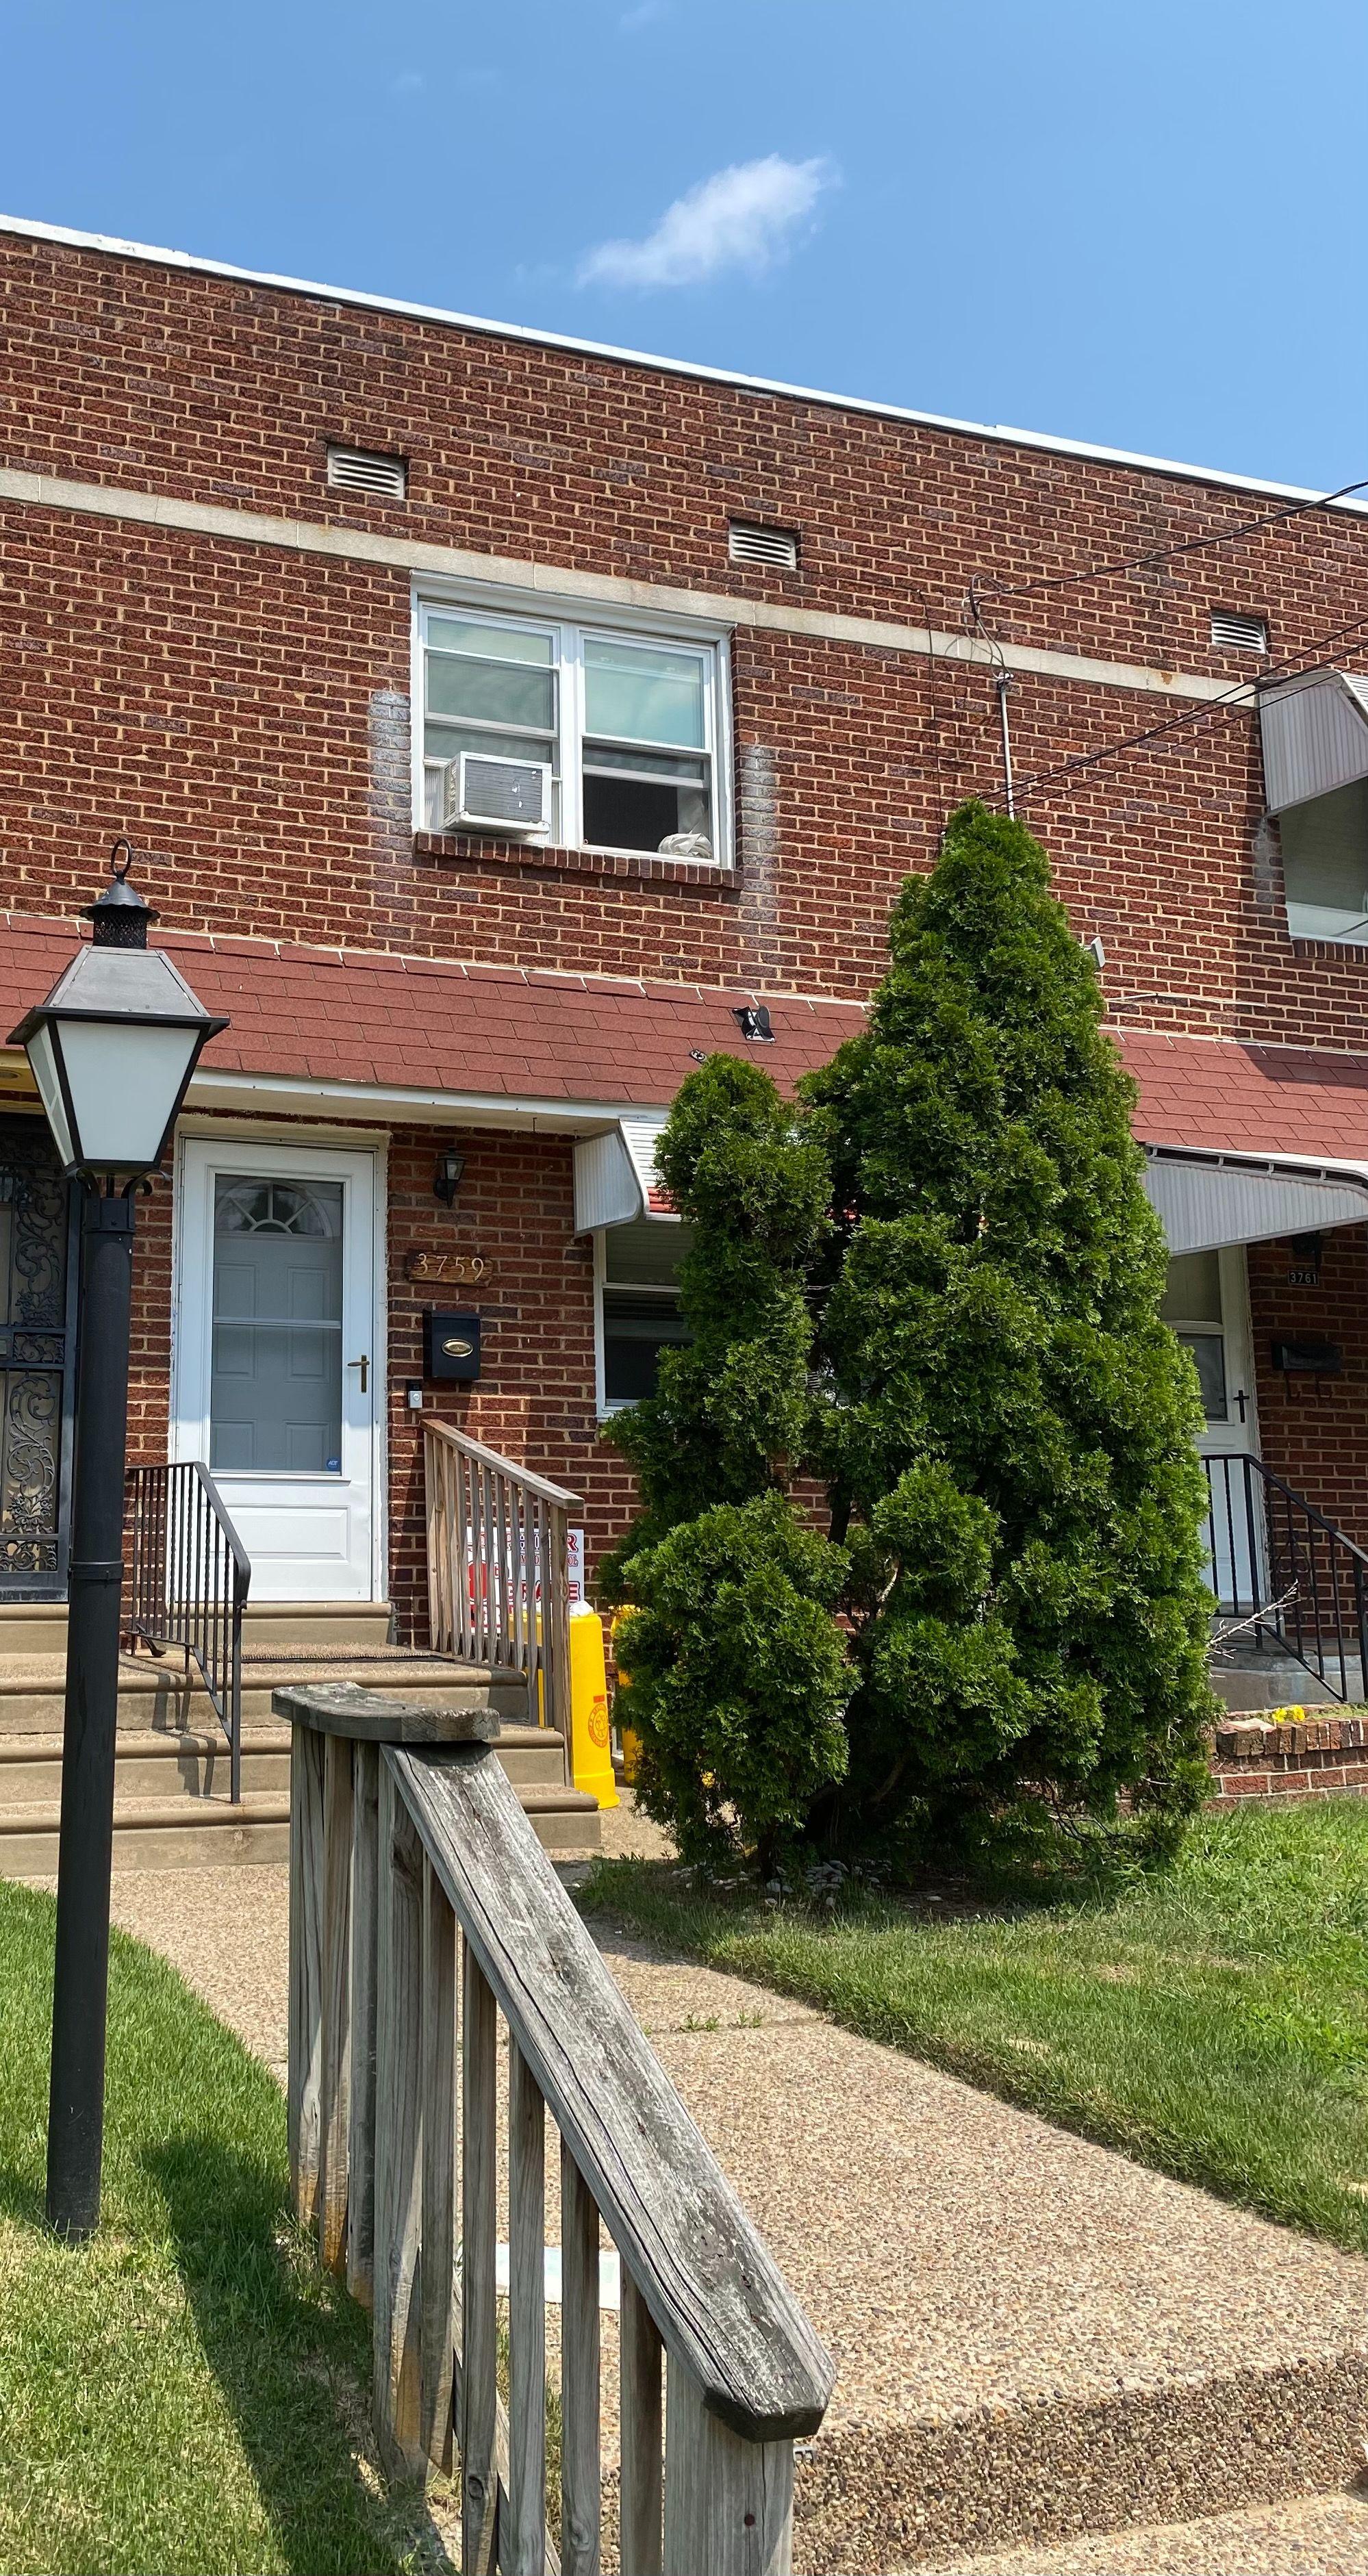 3759 Schleicher Ave, Pennsauken Township, NJ